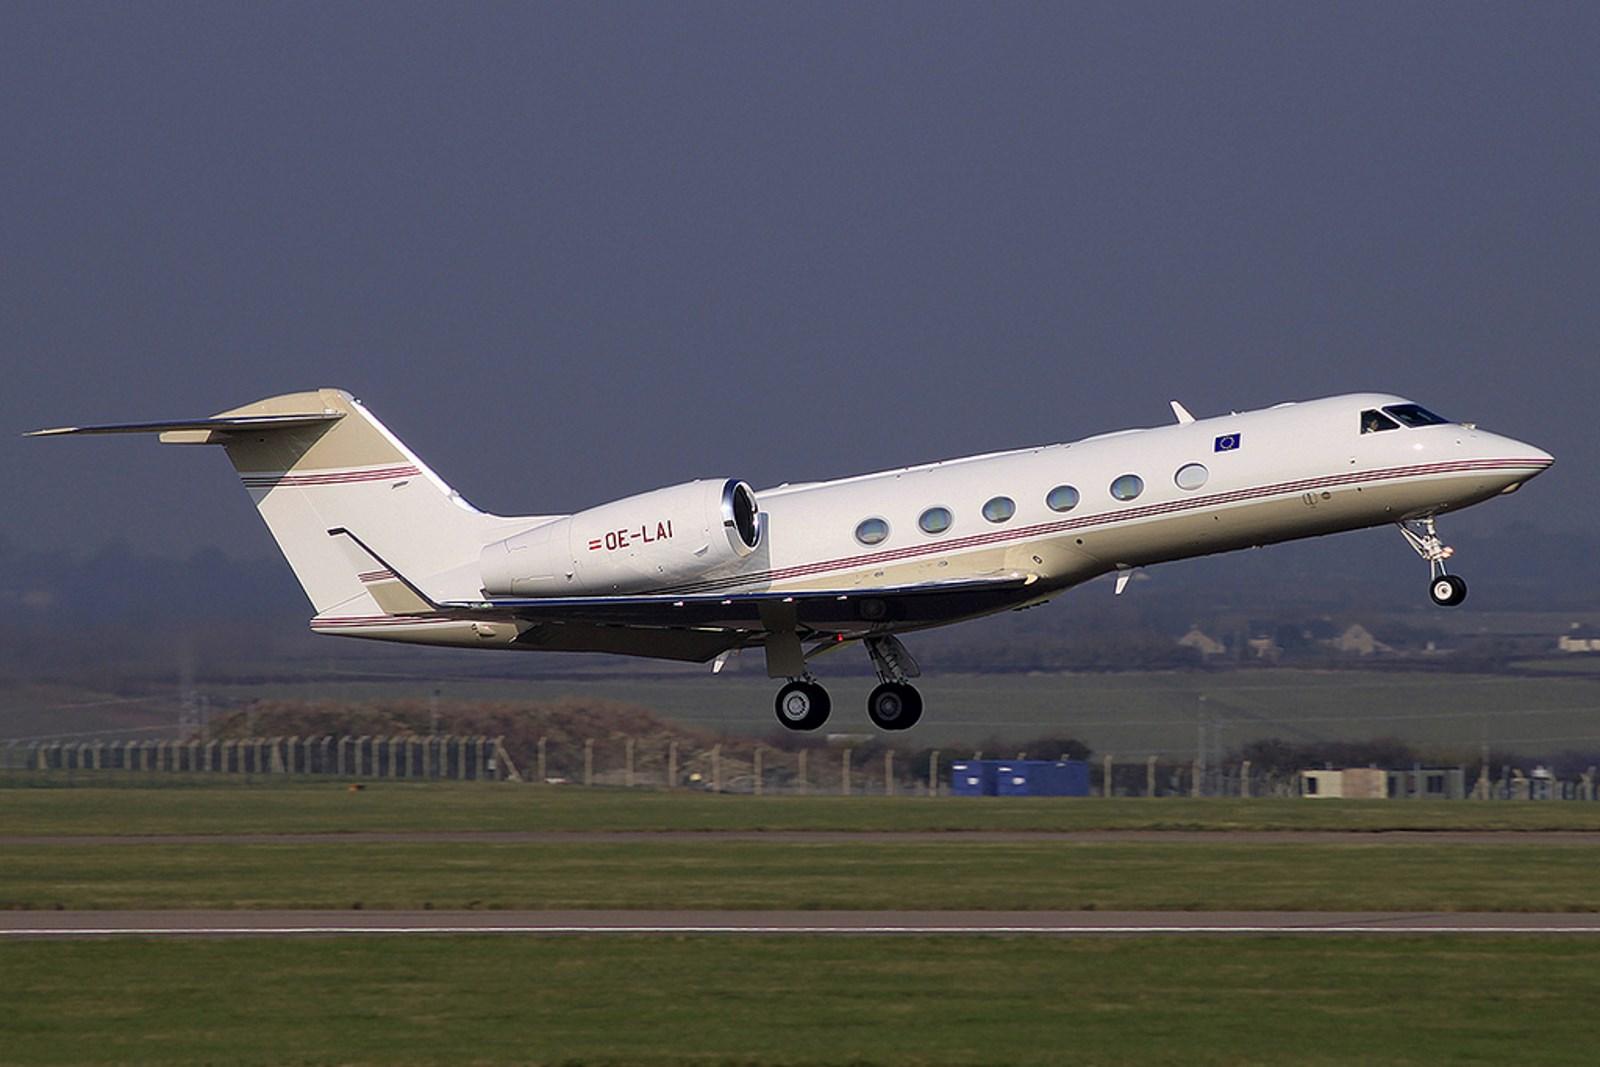 mark pearce lai - Самолет Gulfstream G450